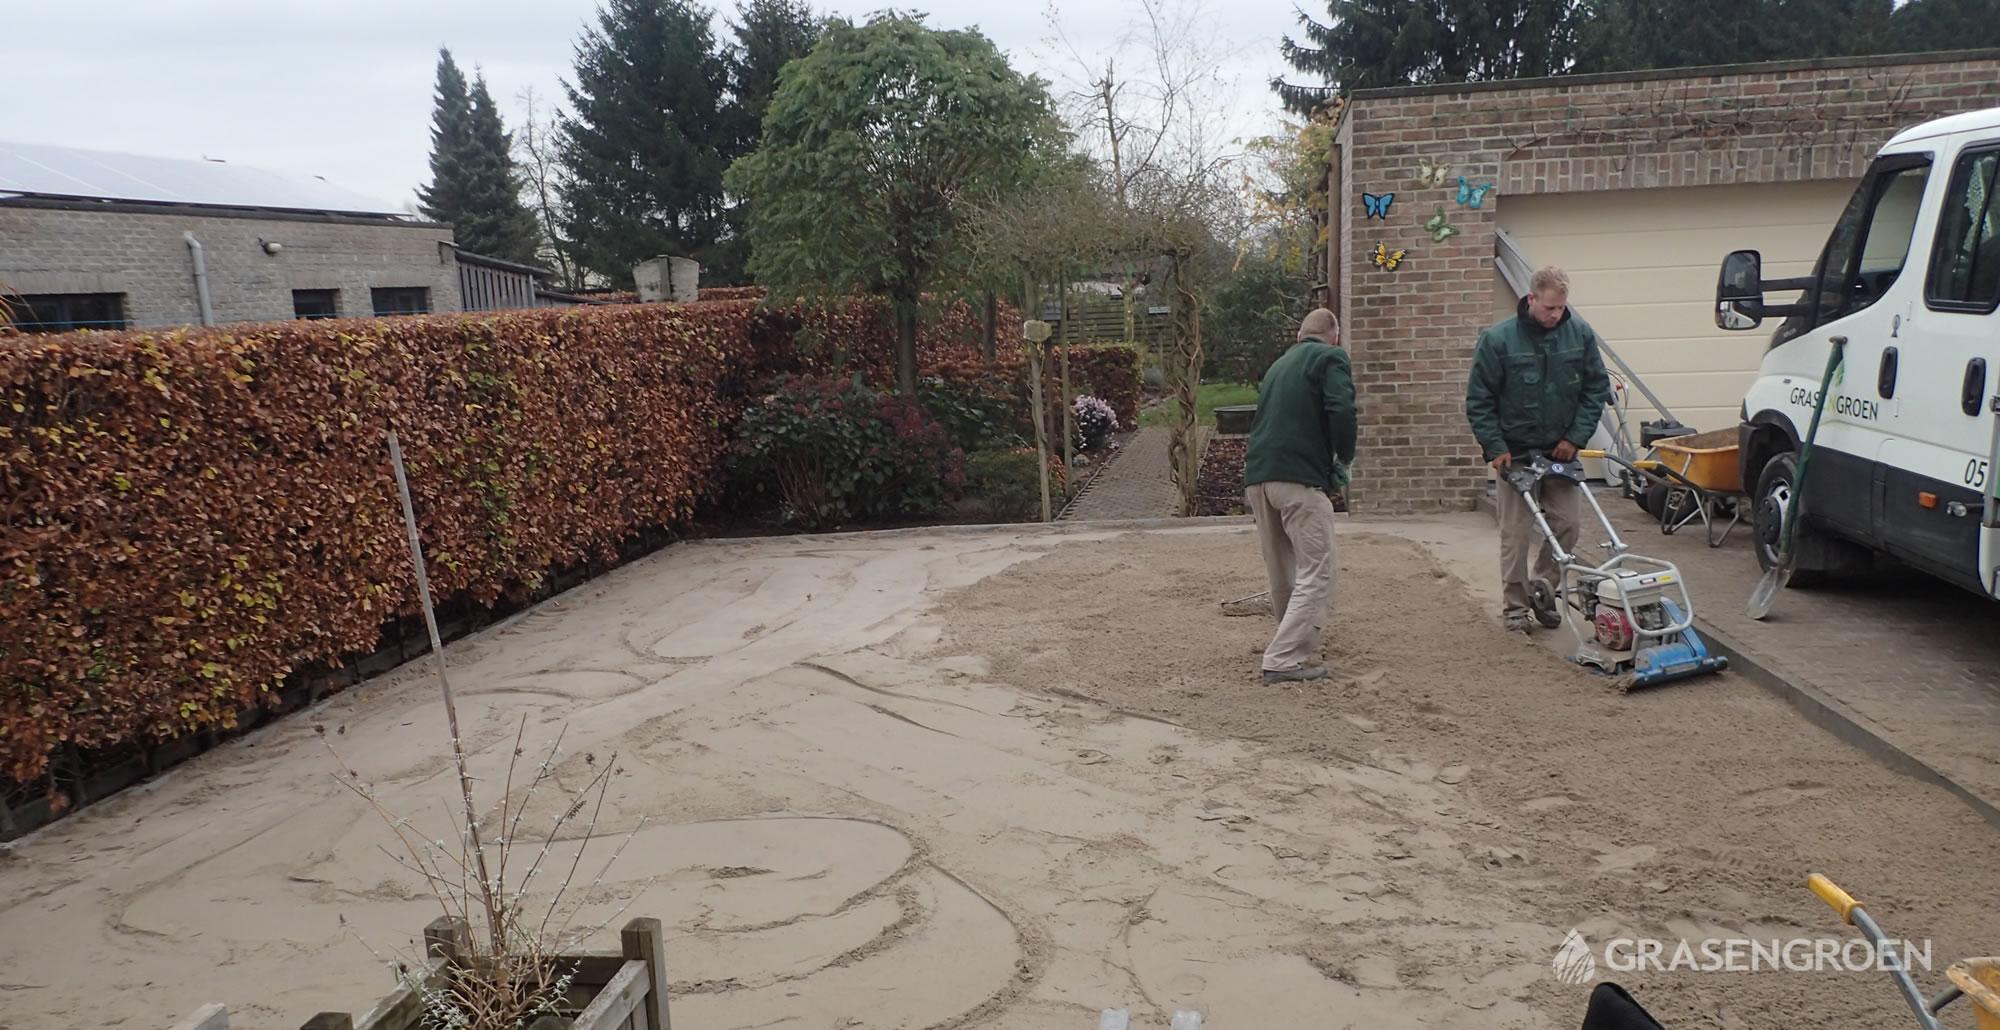 Kunstgrasleggennijlen13 • Gras en Groen Kunstgras